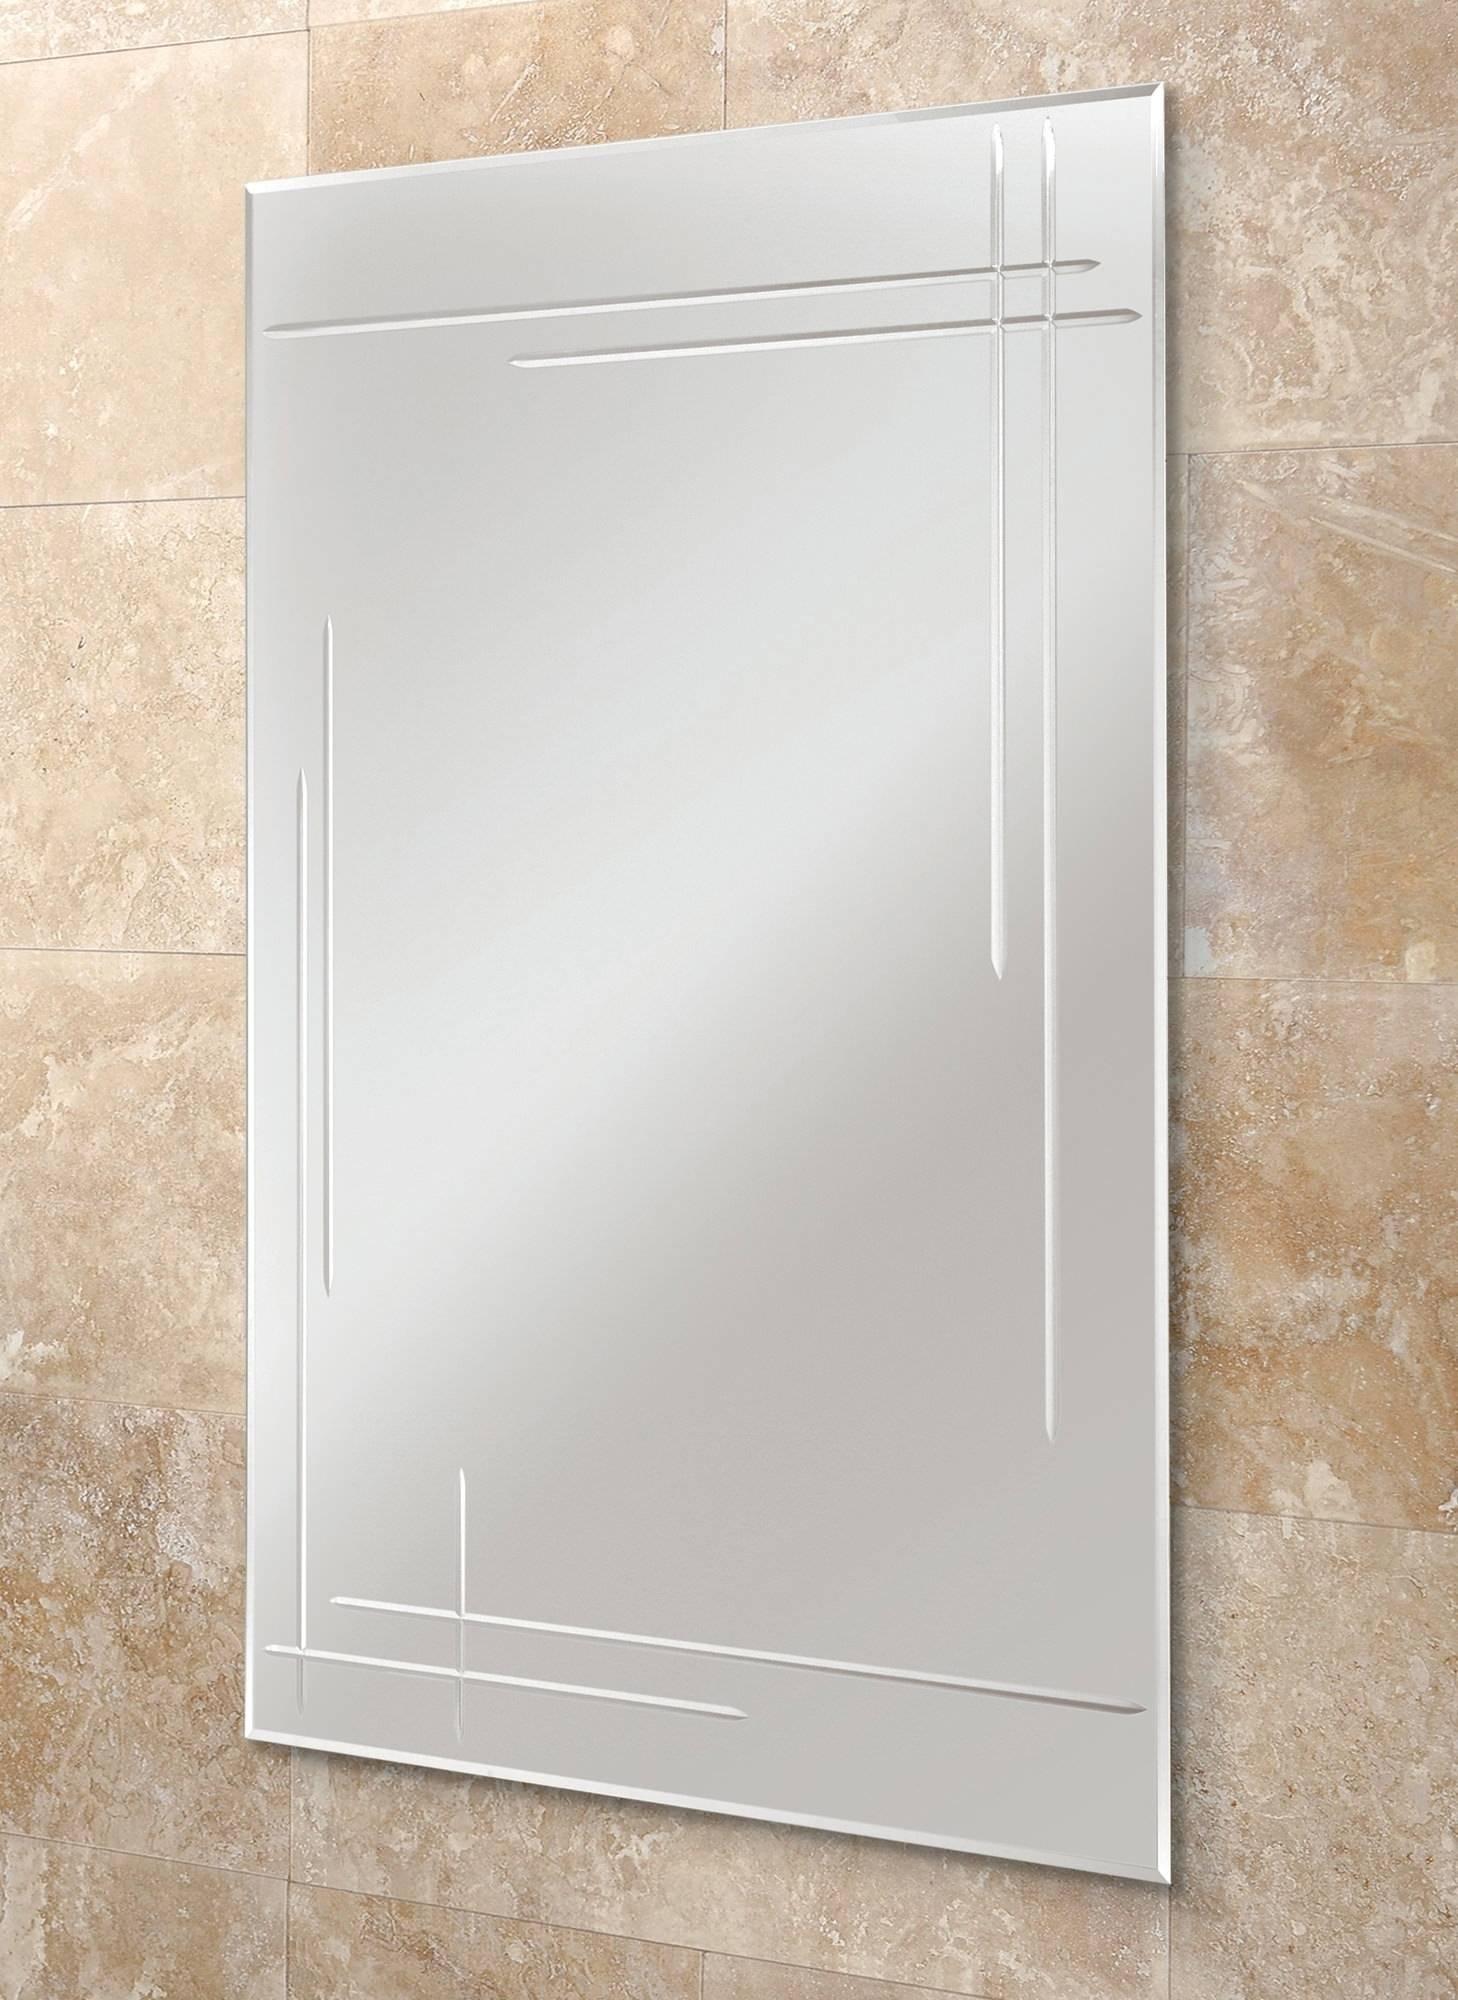 Hib Opus Rectangular Bevelled Edge Bathroom Mirror 500 X 700Mm throughout Bevelled Edge Bathroom Mirrors (Image 8 of 15)